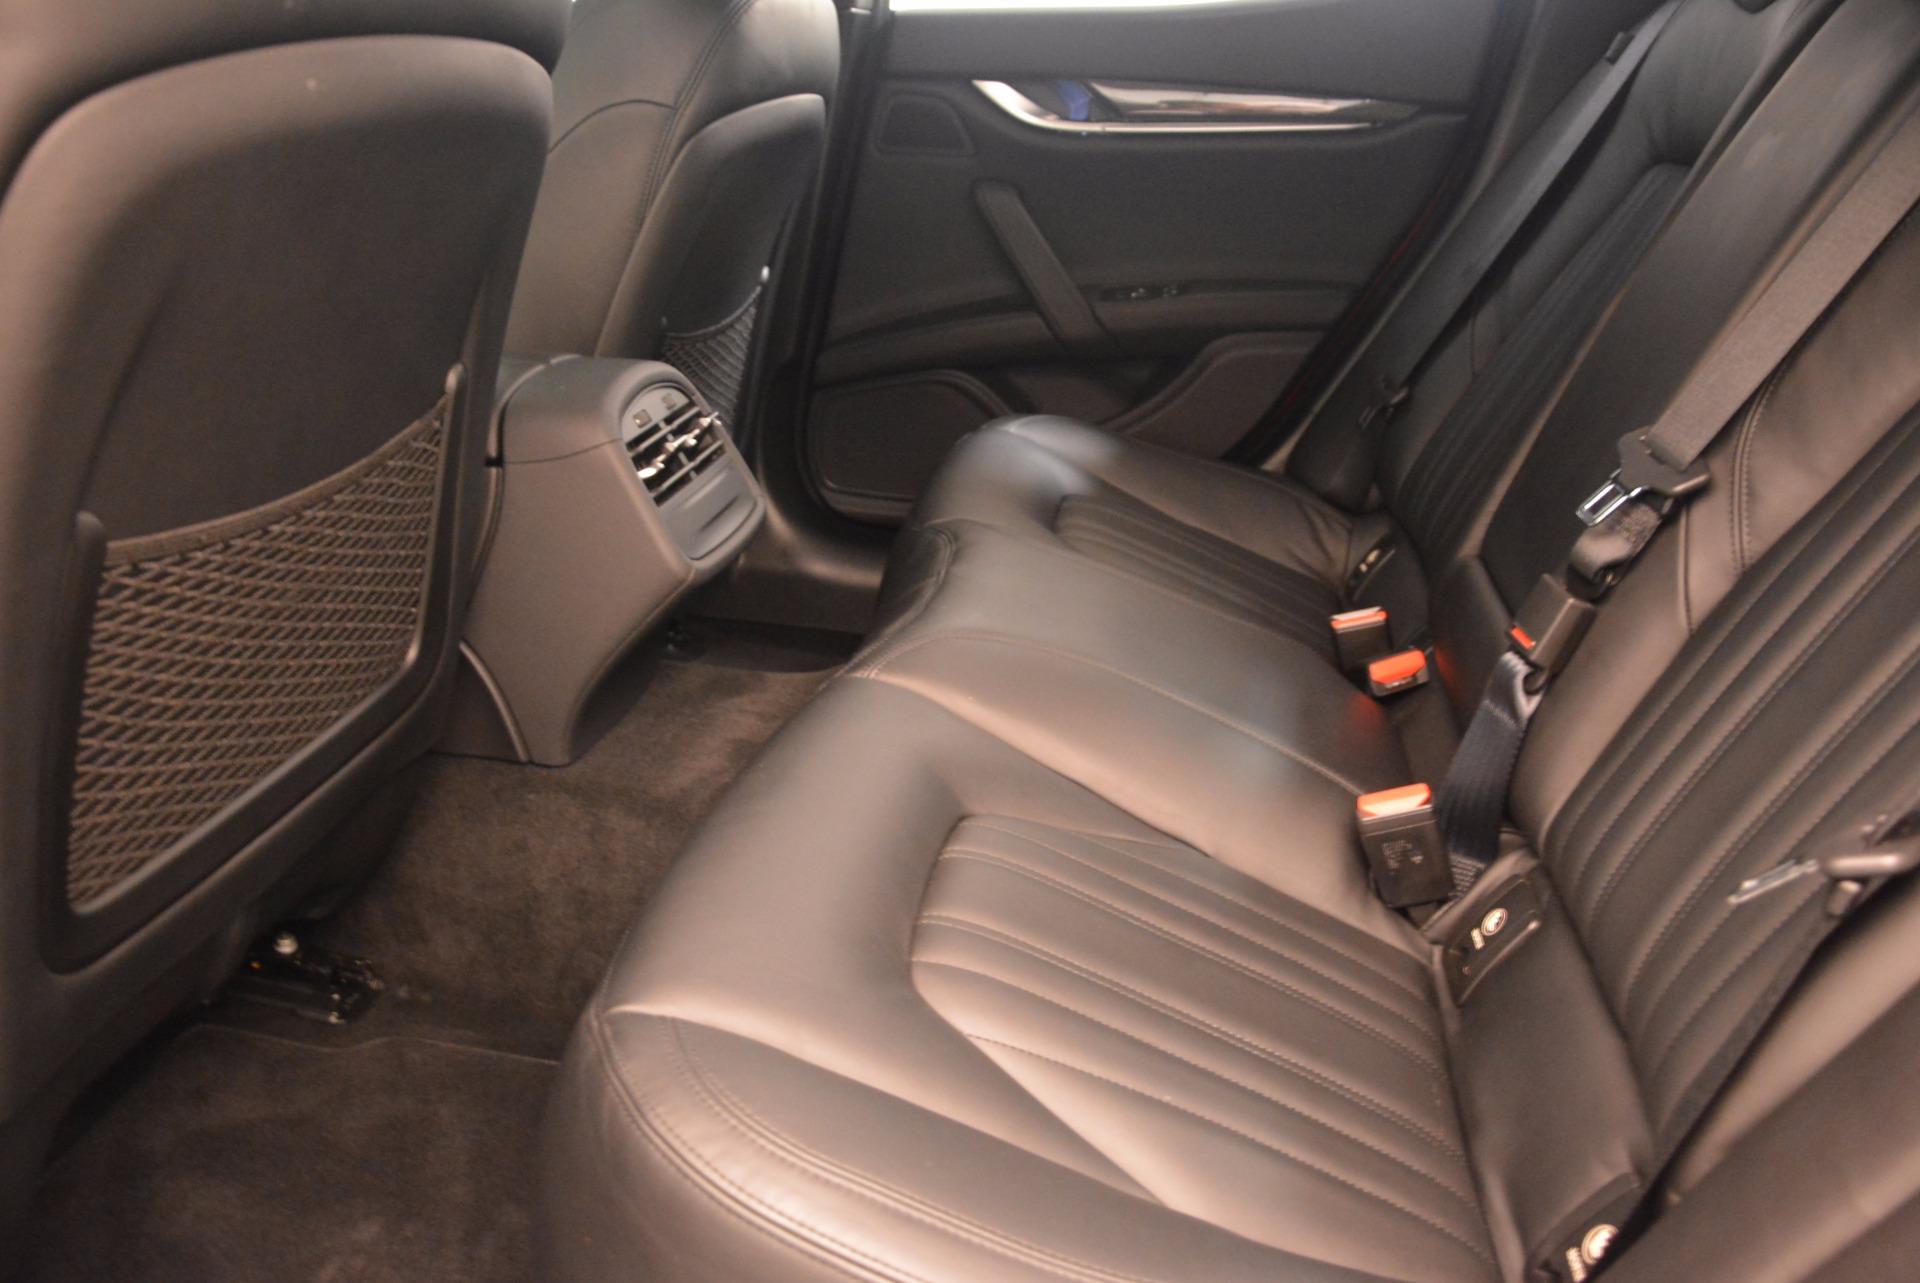 Used 2014 Maserati Ghibli S Q4 For Sale In Greenwich, CT. Alfa Romeo of Greenwich, 7203 1158_p17